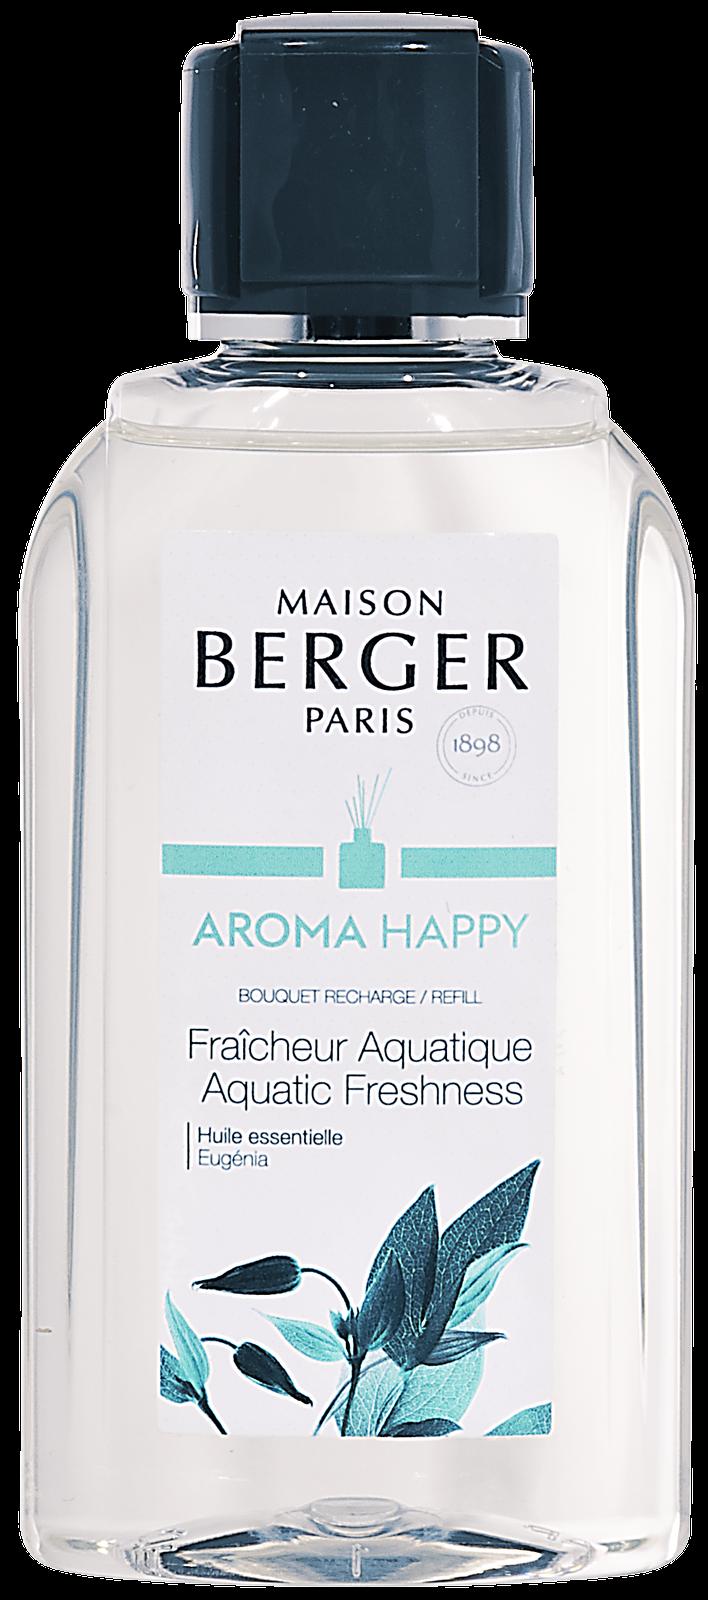 Aroma Happy Aquatic Freshness 200 ml Refill